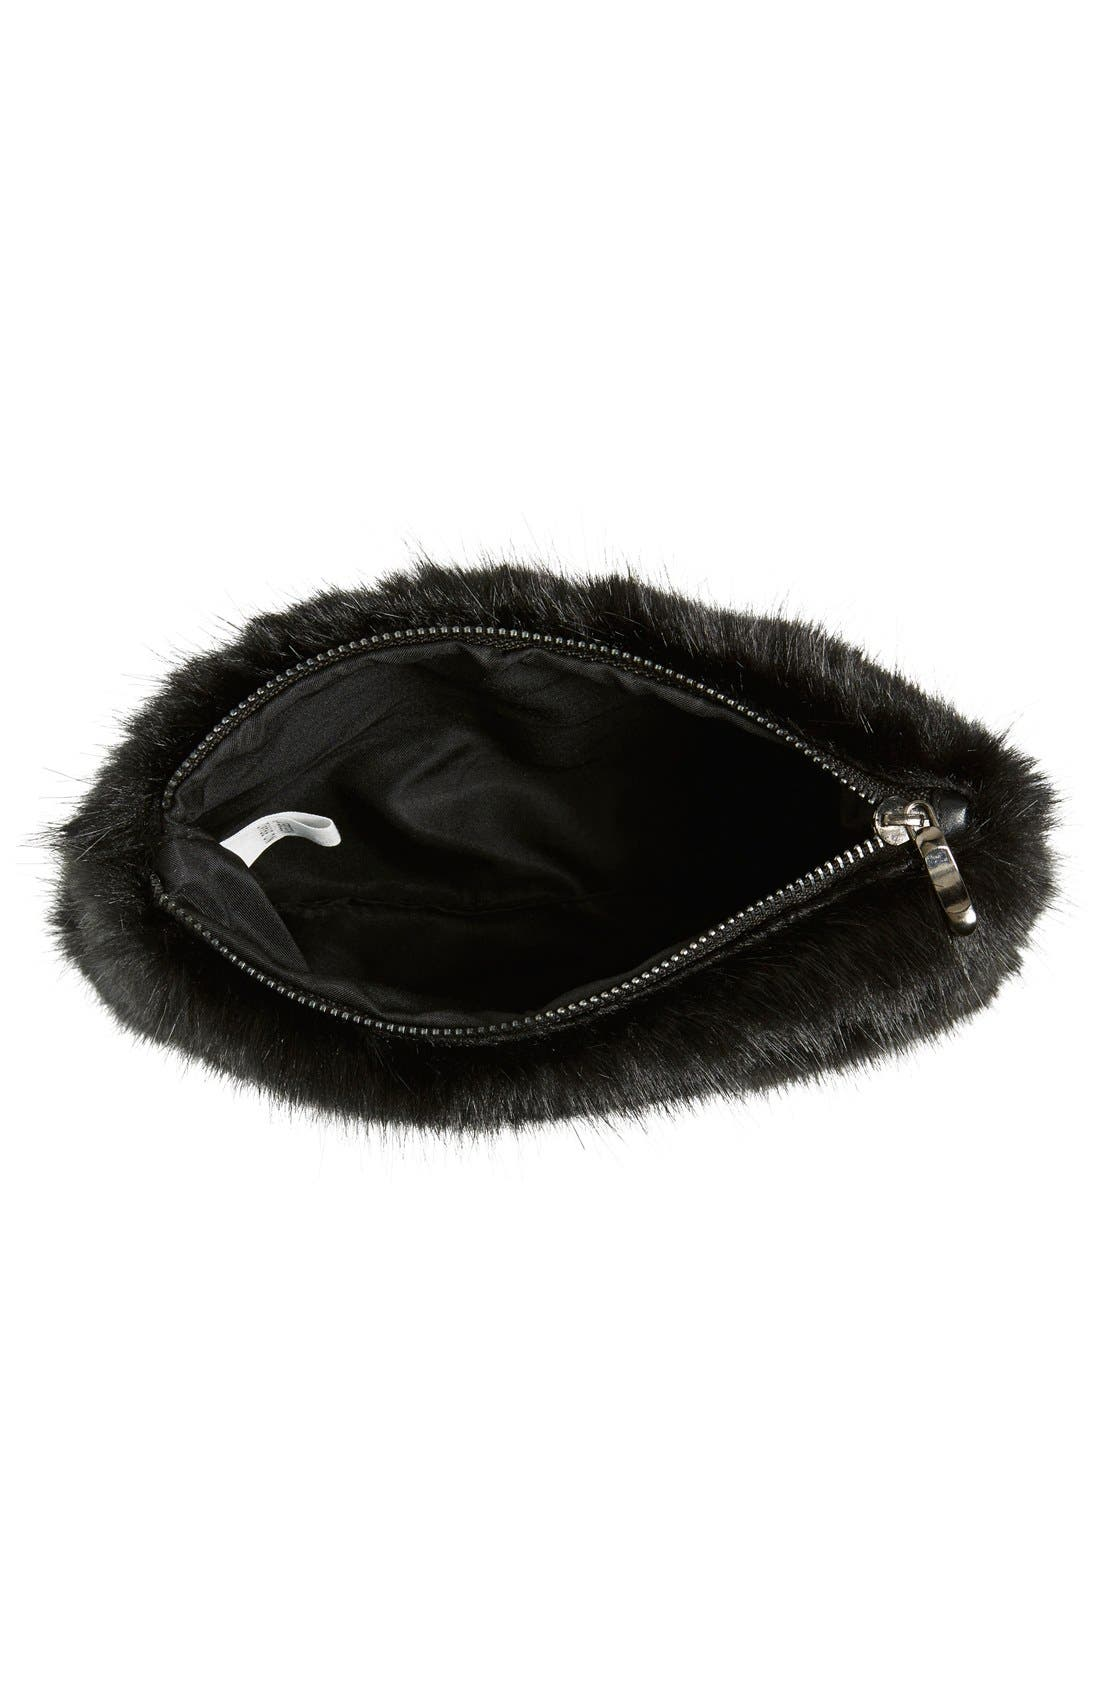 LA DOUBLE 7,                             No Brand Needed Faux Fur Convertible Clutch,                             Alternate thumbnail 2, color,                             001